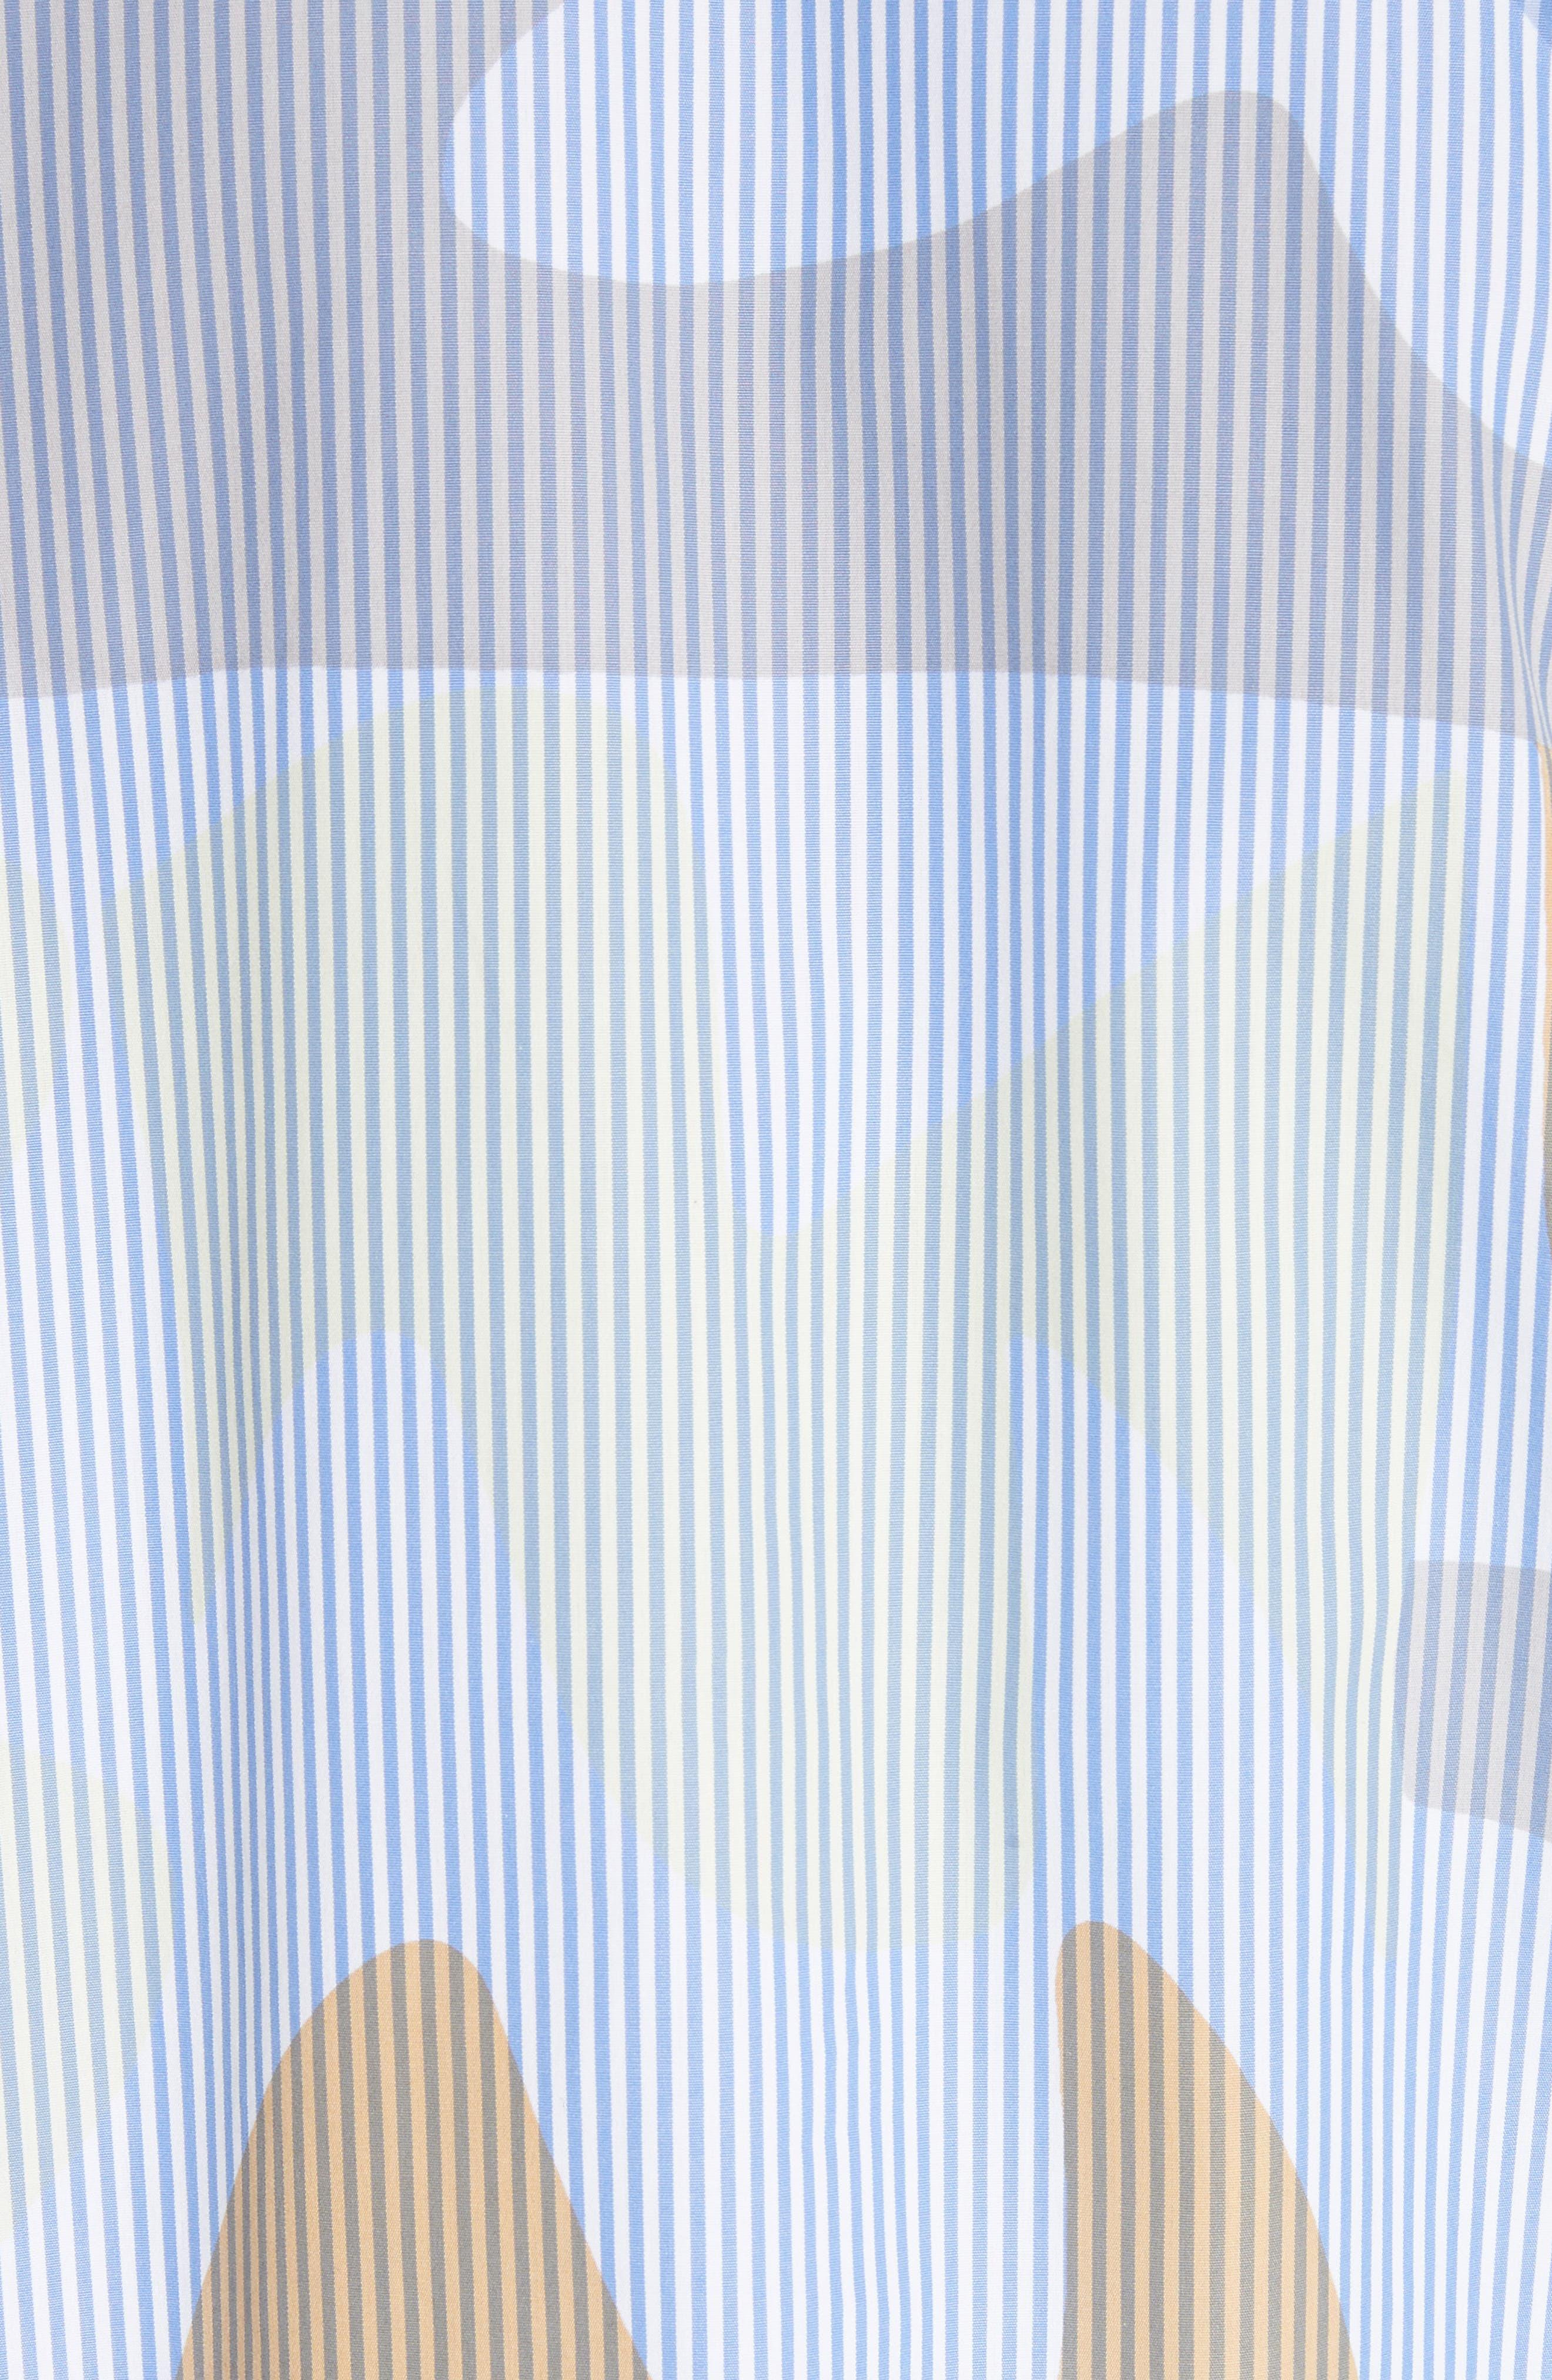 Carla Urban Ethos Stripe Blouse,                             Alternate thumbnail 5, color,                             Periwinkle Multi